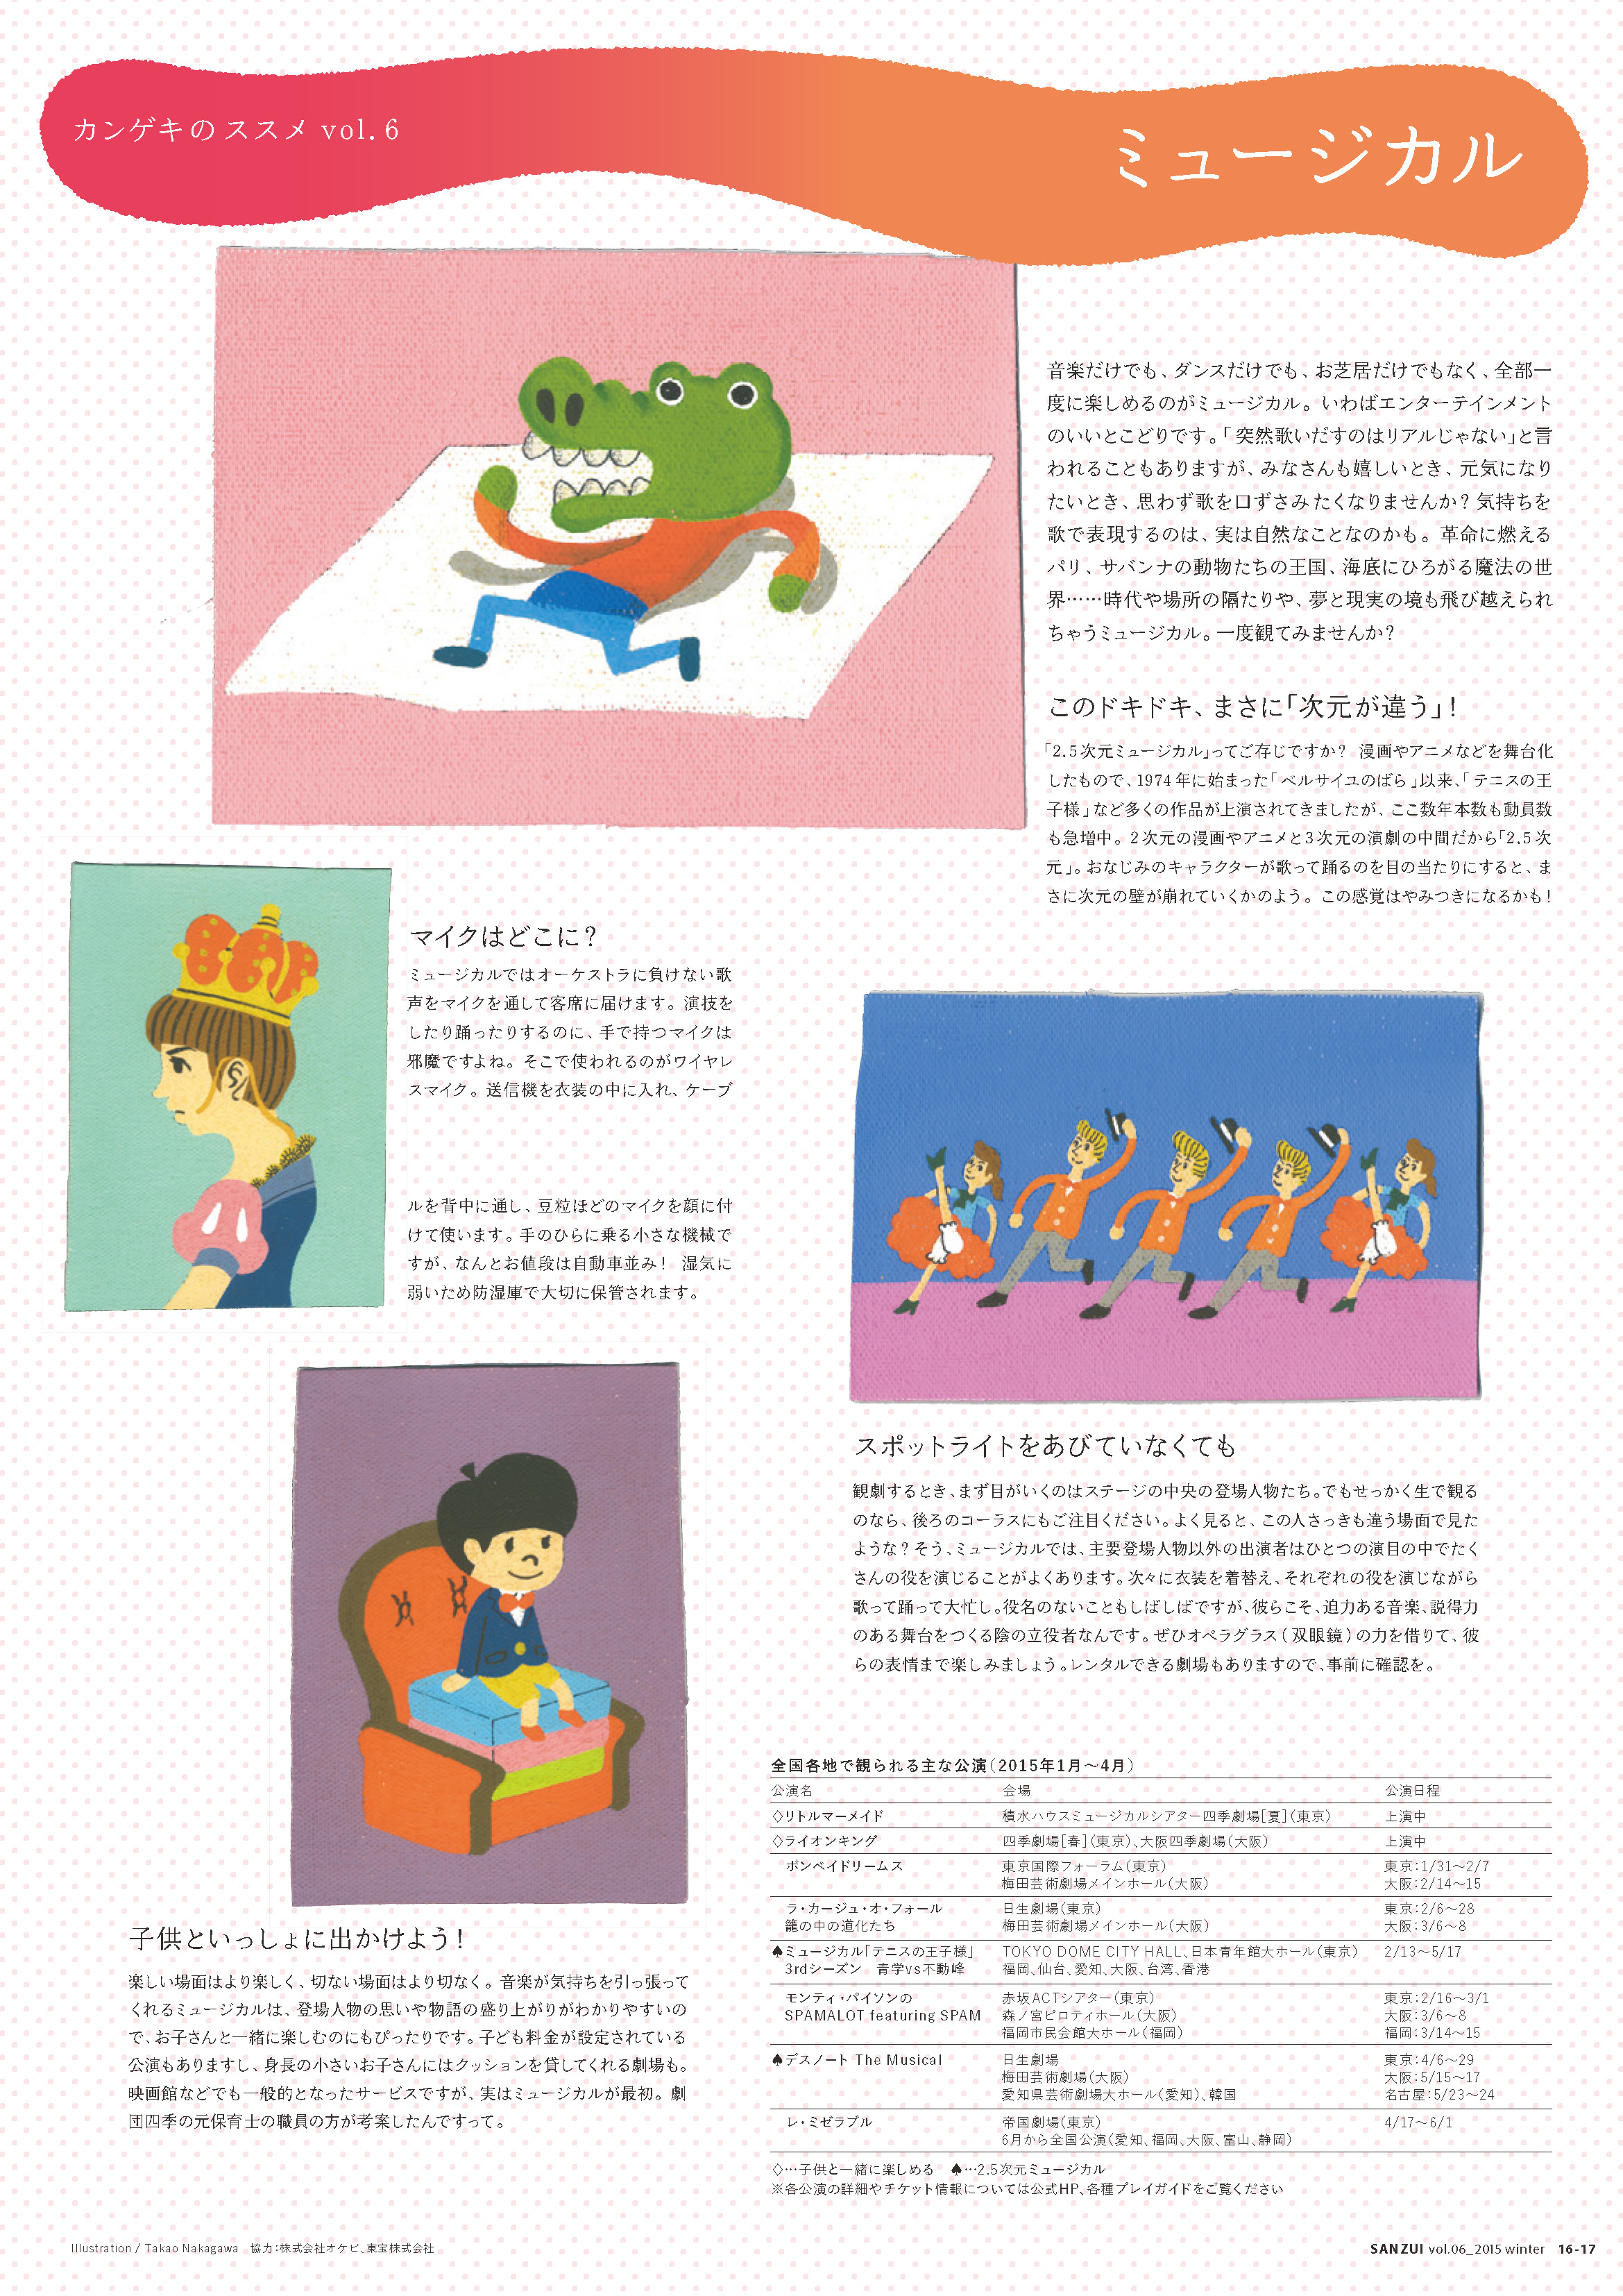 sanzui06_07.jpg